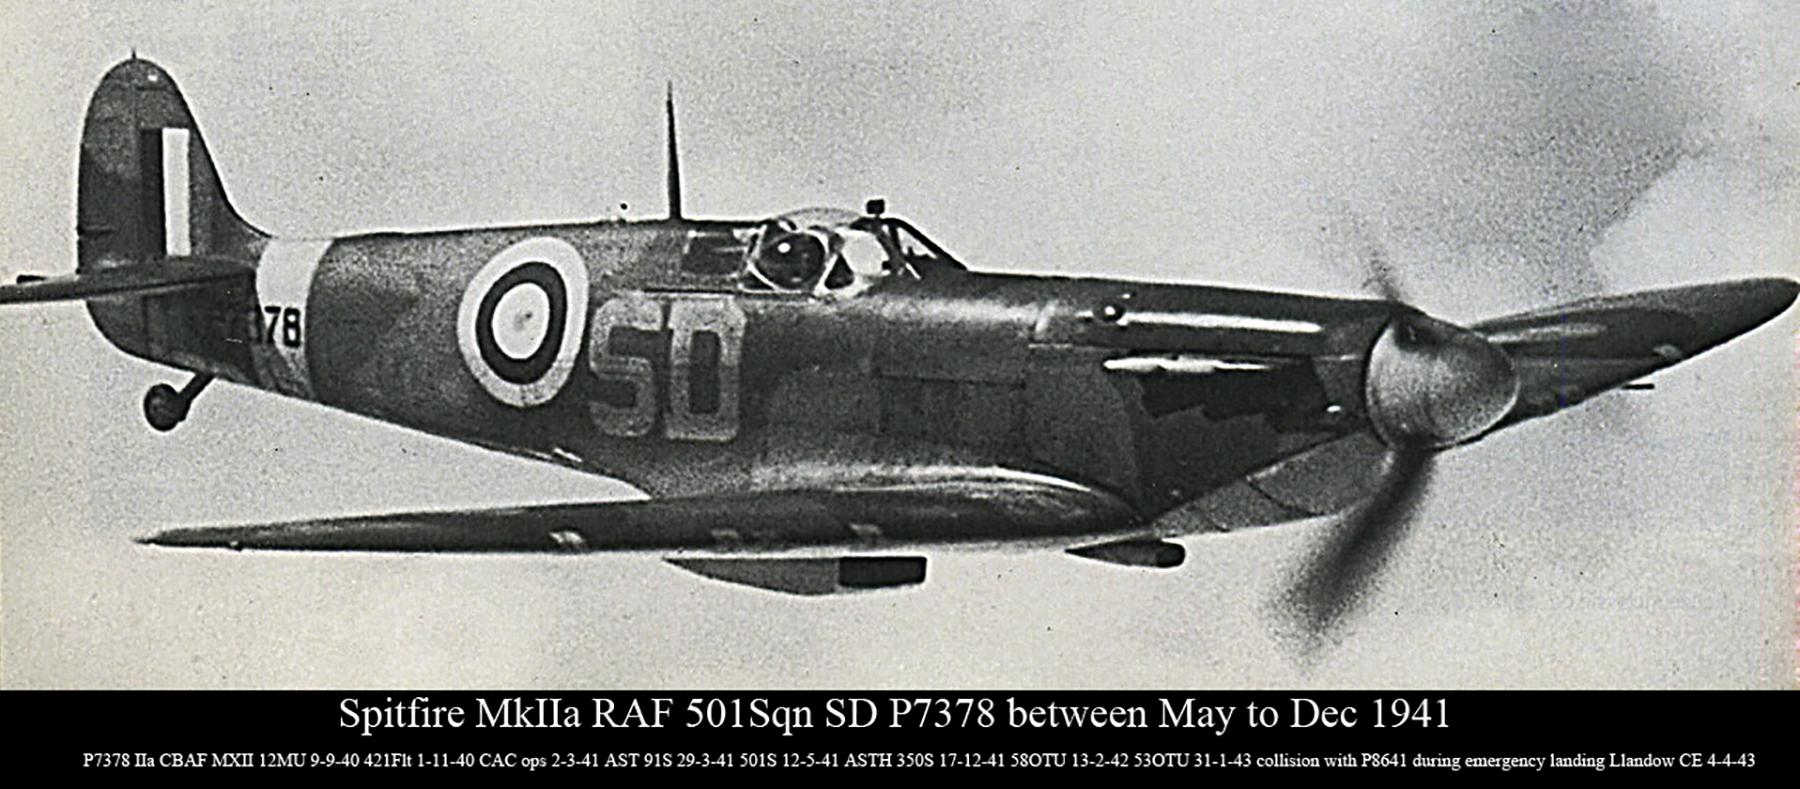 Spitfire MkIIa RAF 501Sqn SD P7378 between May to Dec 1941